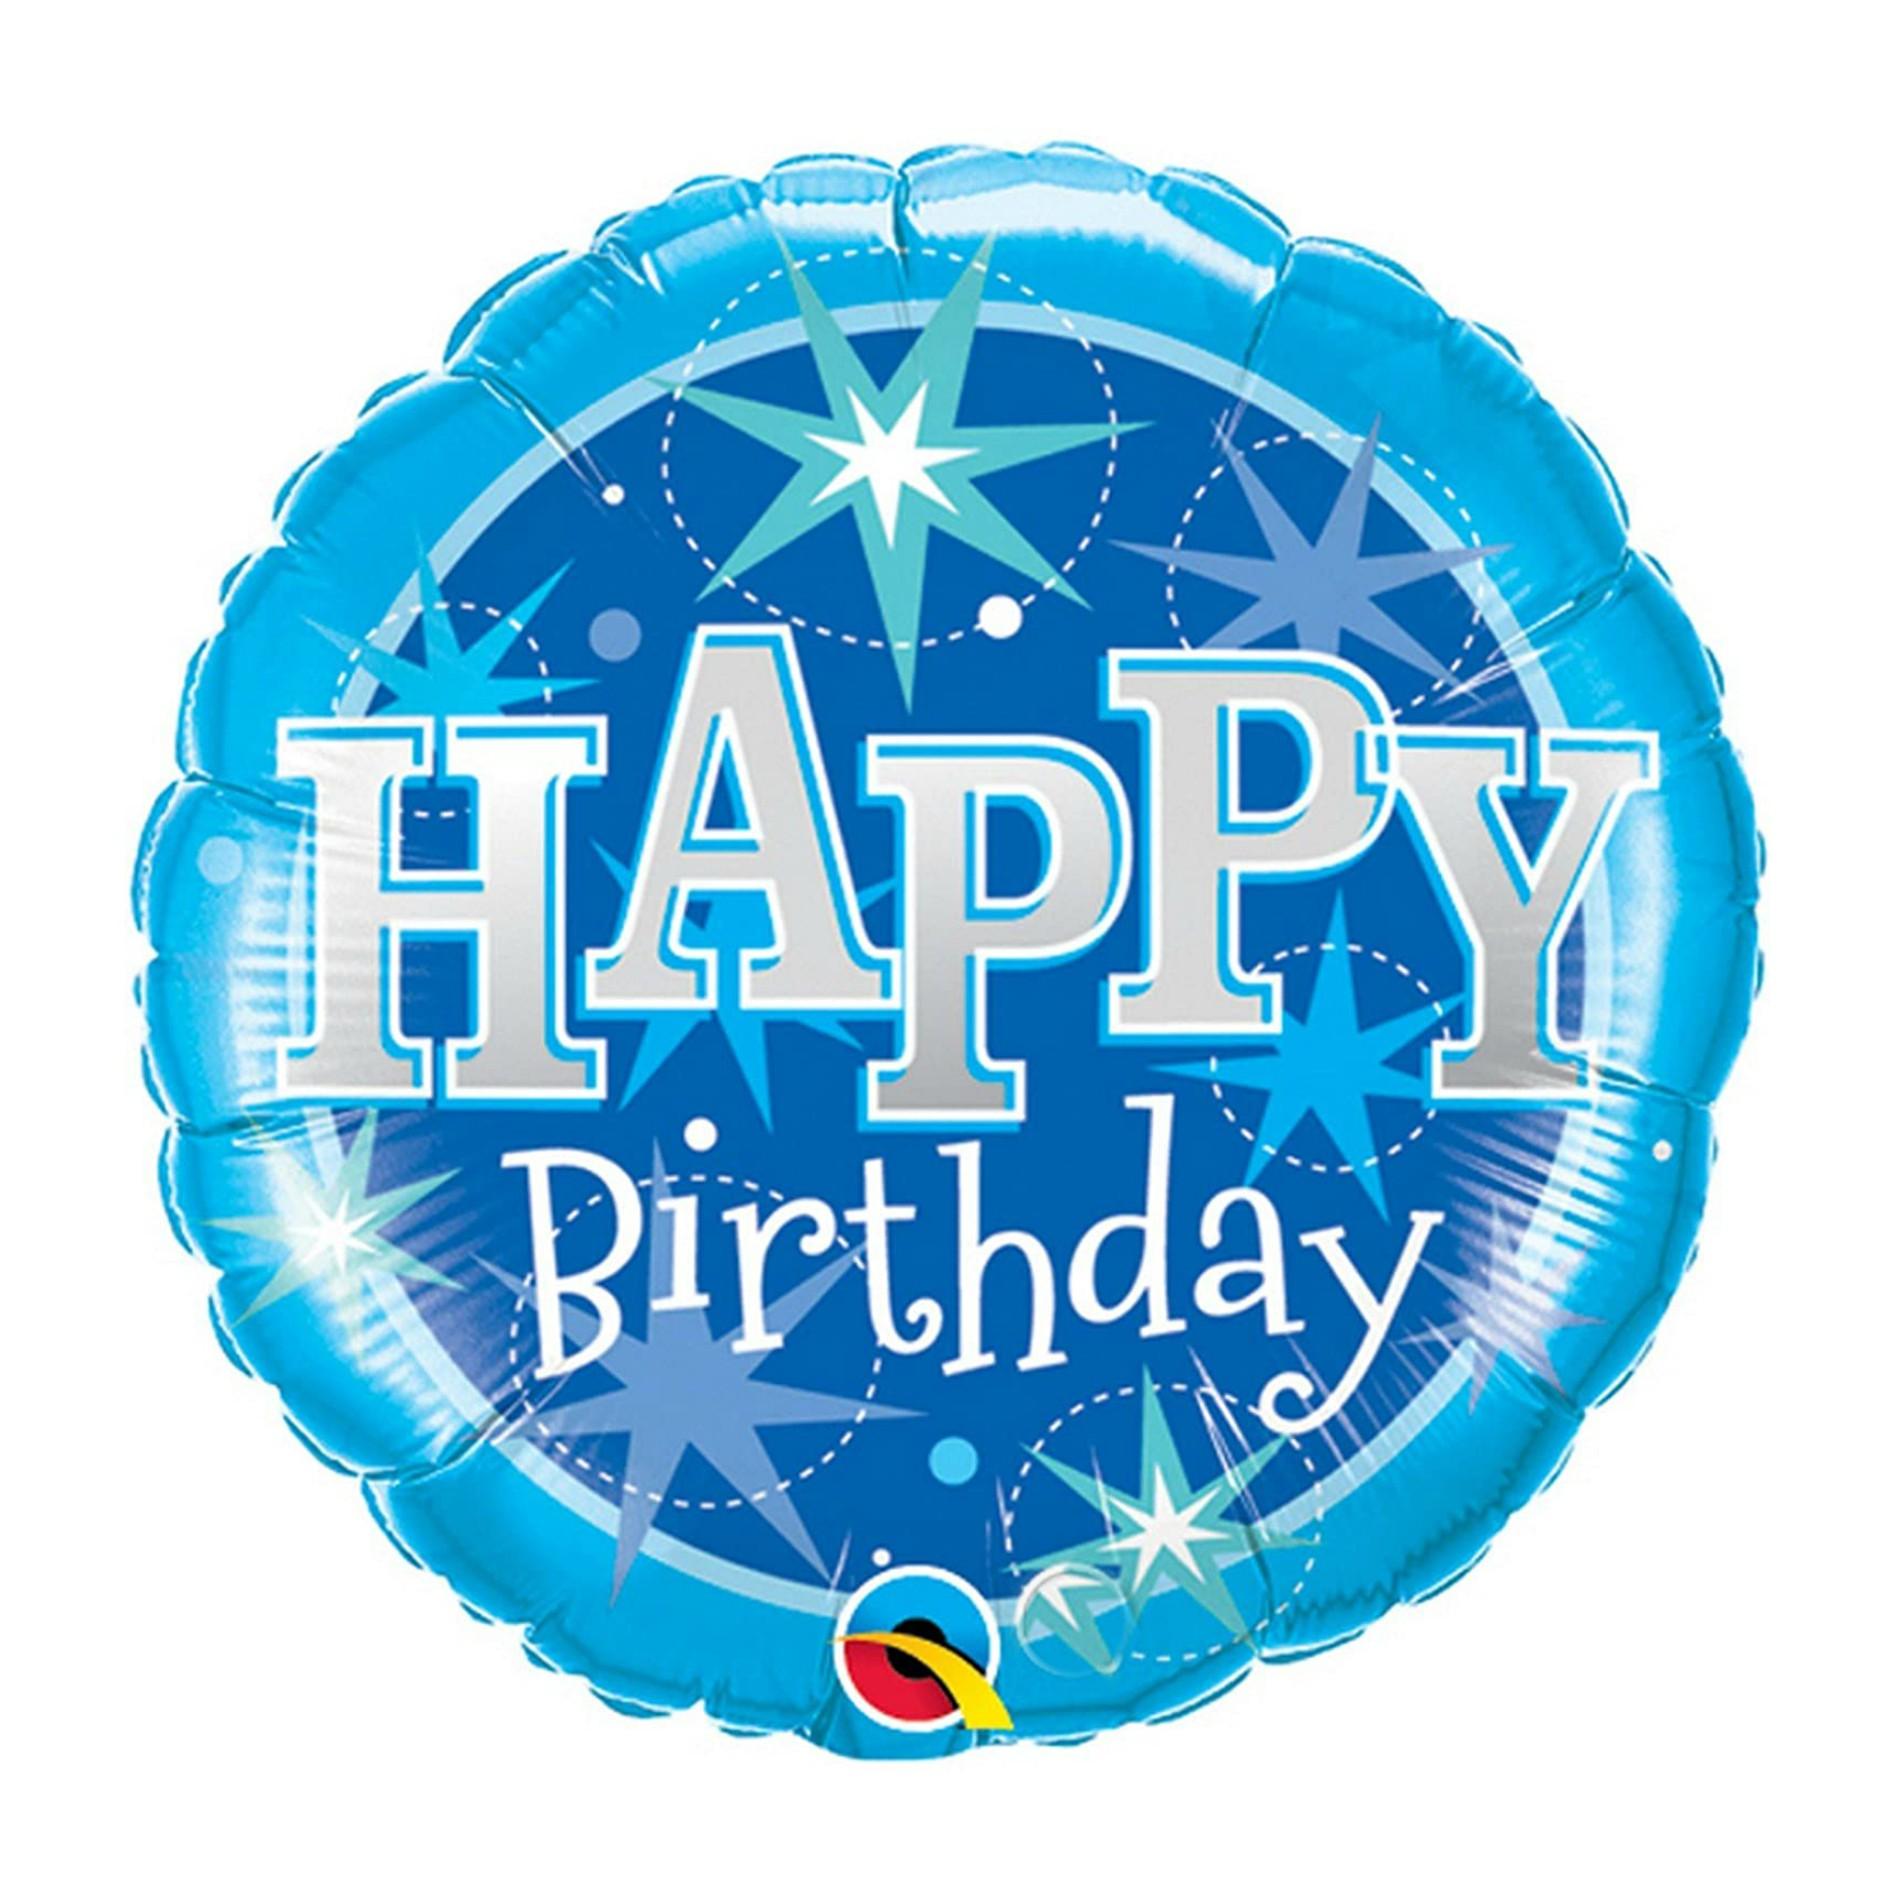 Blue Starburst Happy Birthday Balloon National 5 And 10